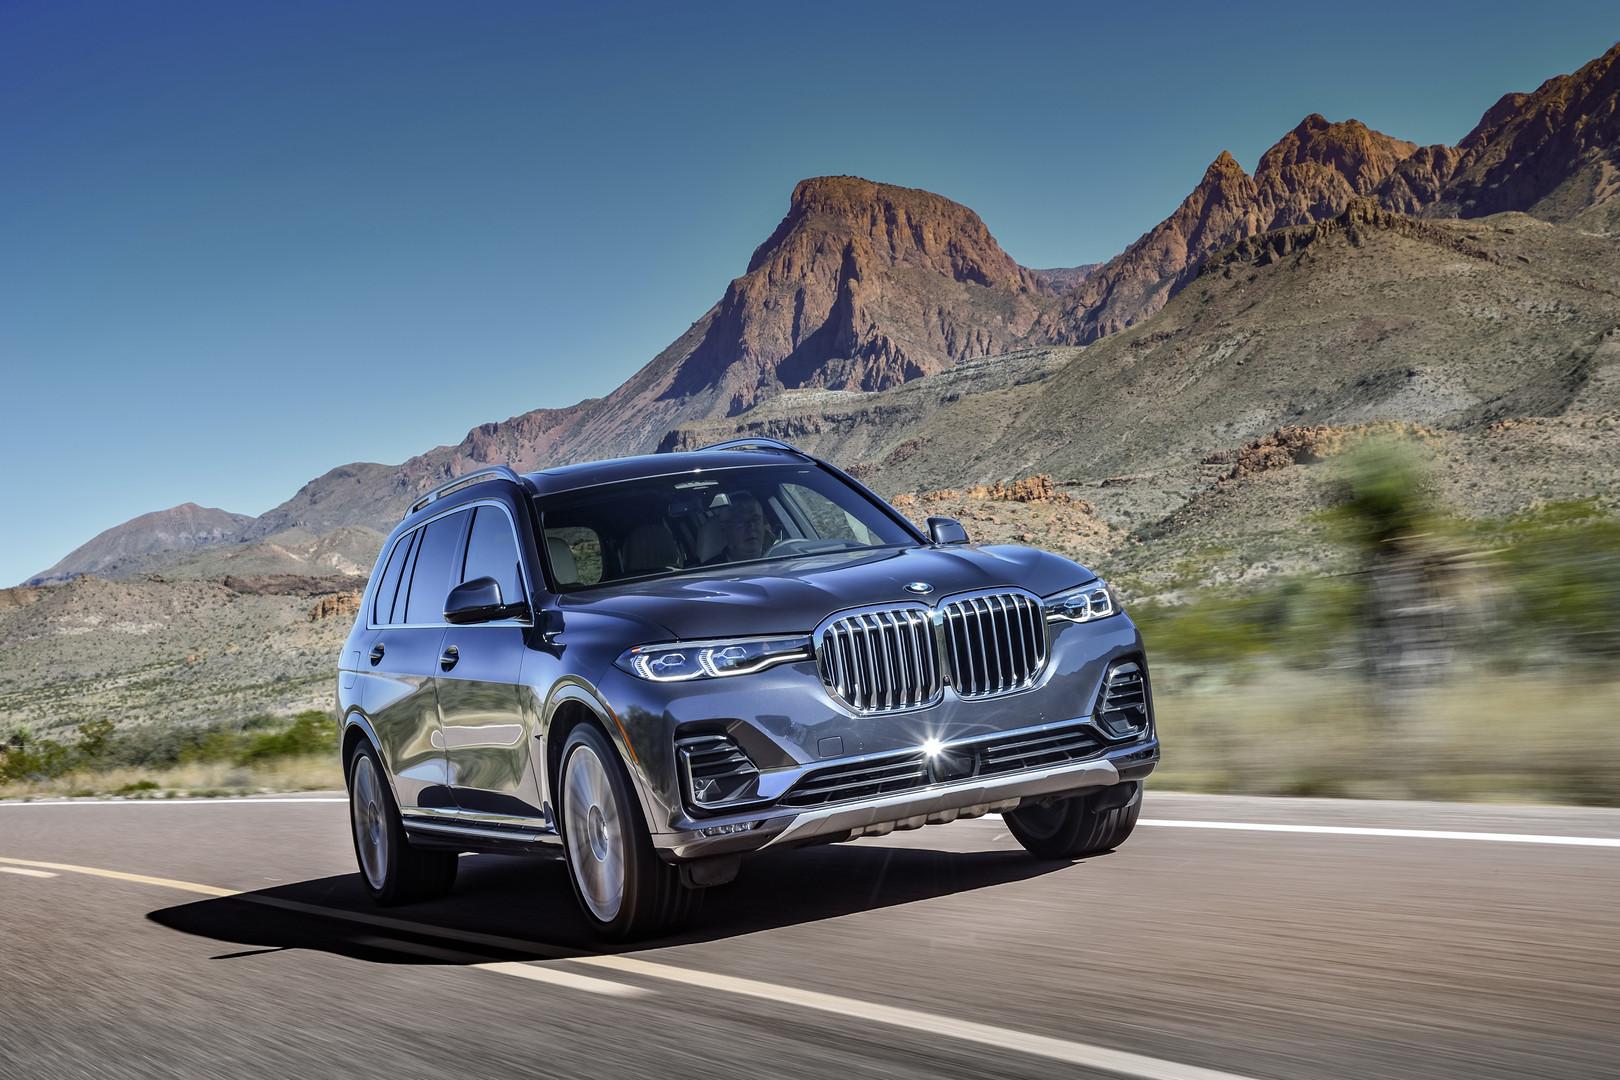 7 Passenger Suv >> BMW X7 Review - GTspirit